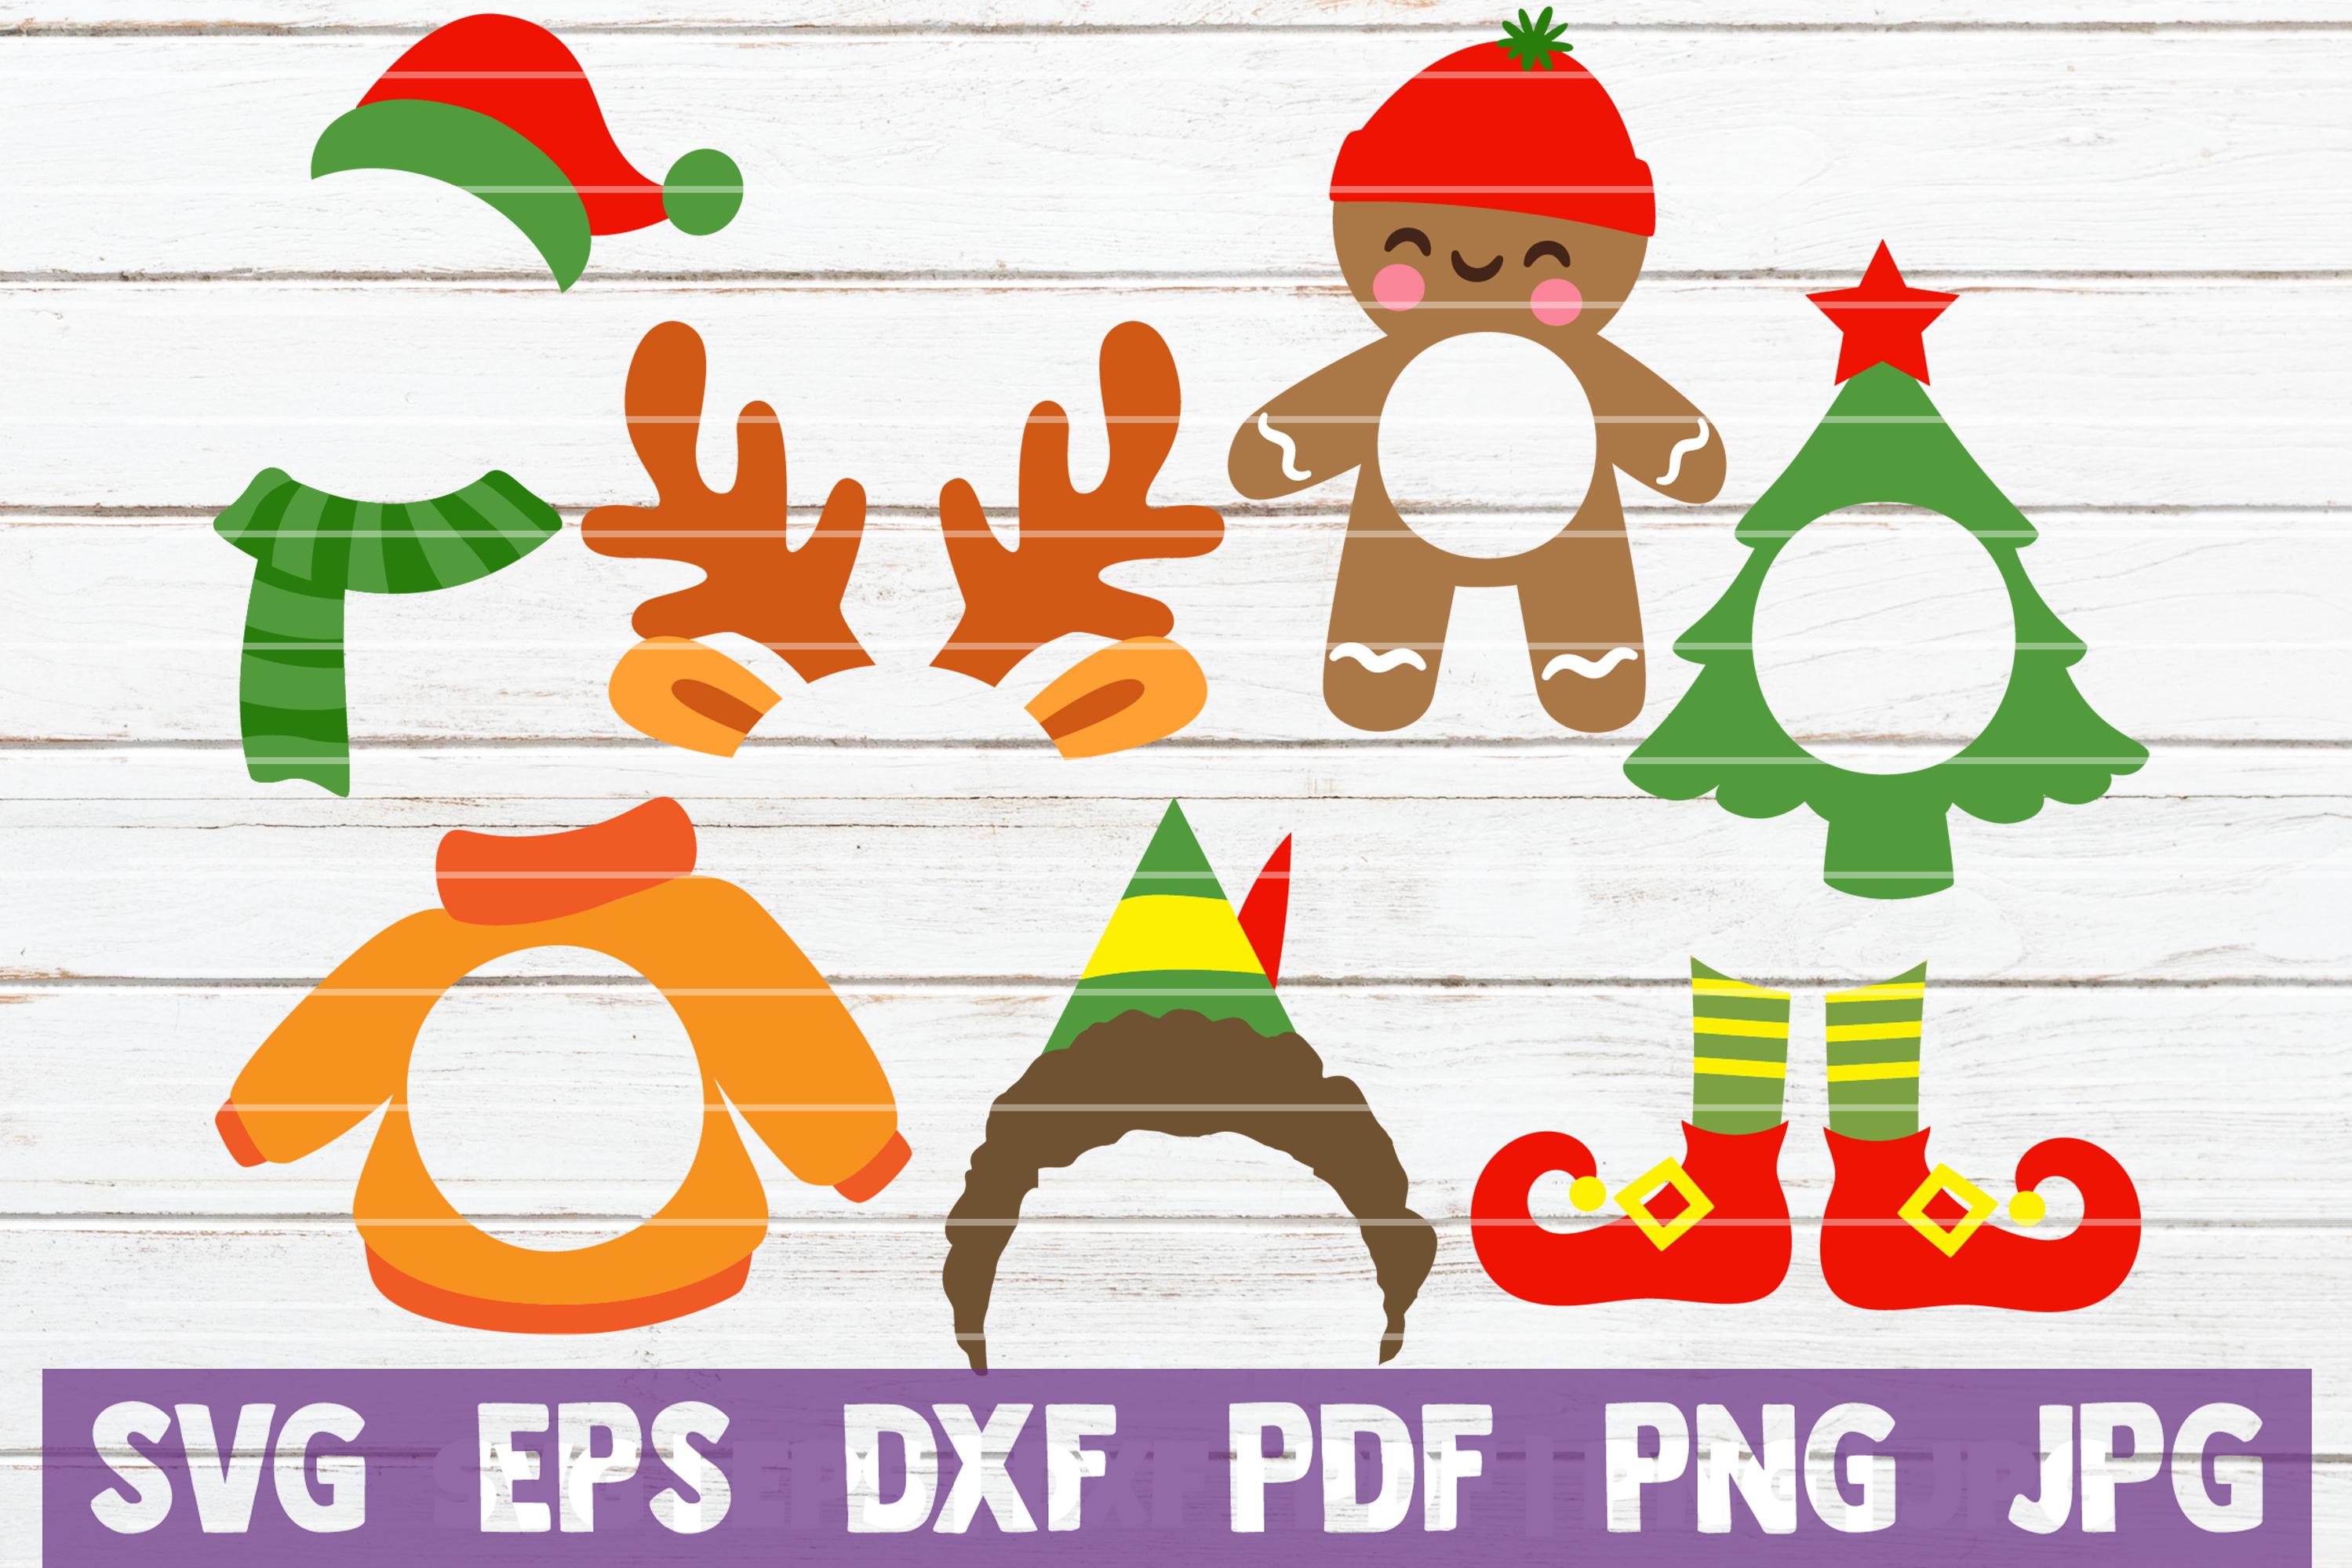 HUGE Christmas SVG Bundle |100 Holiday Designs SVG Cut Files example image 9